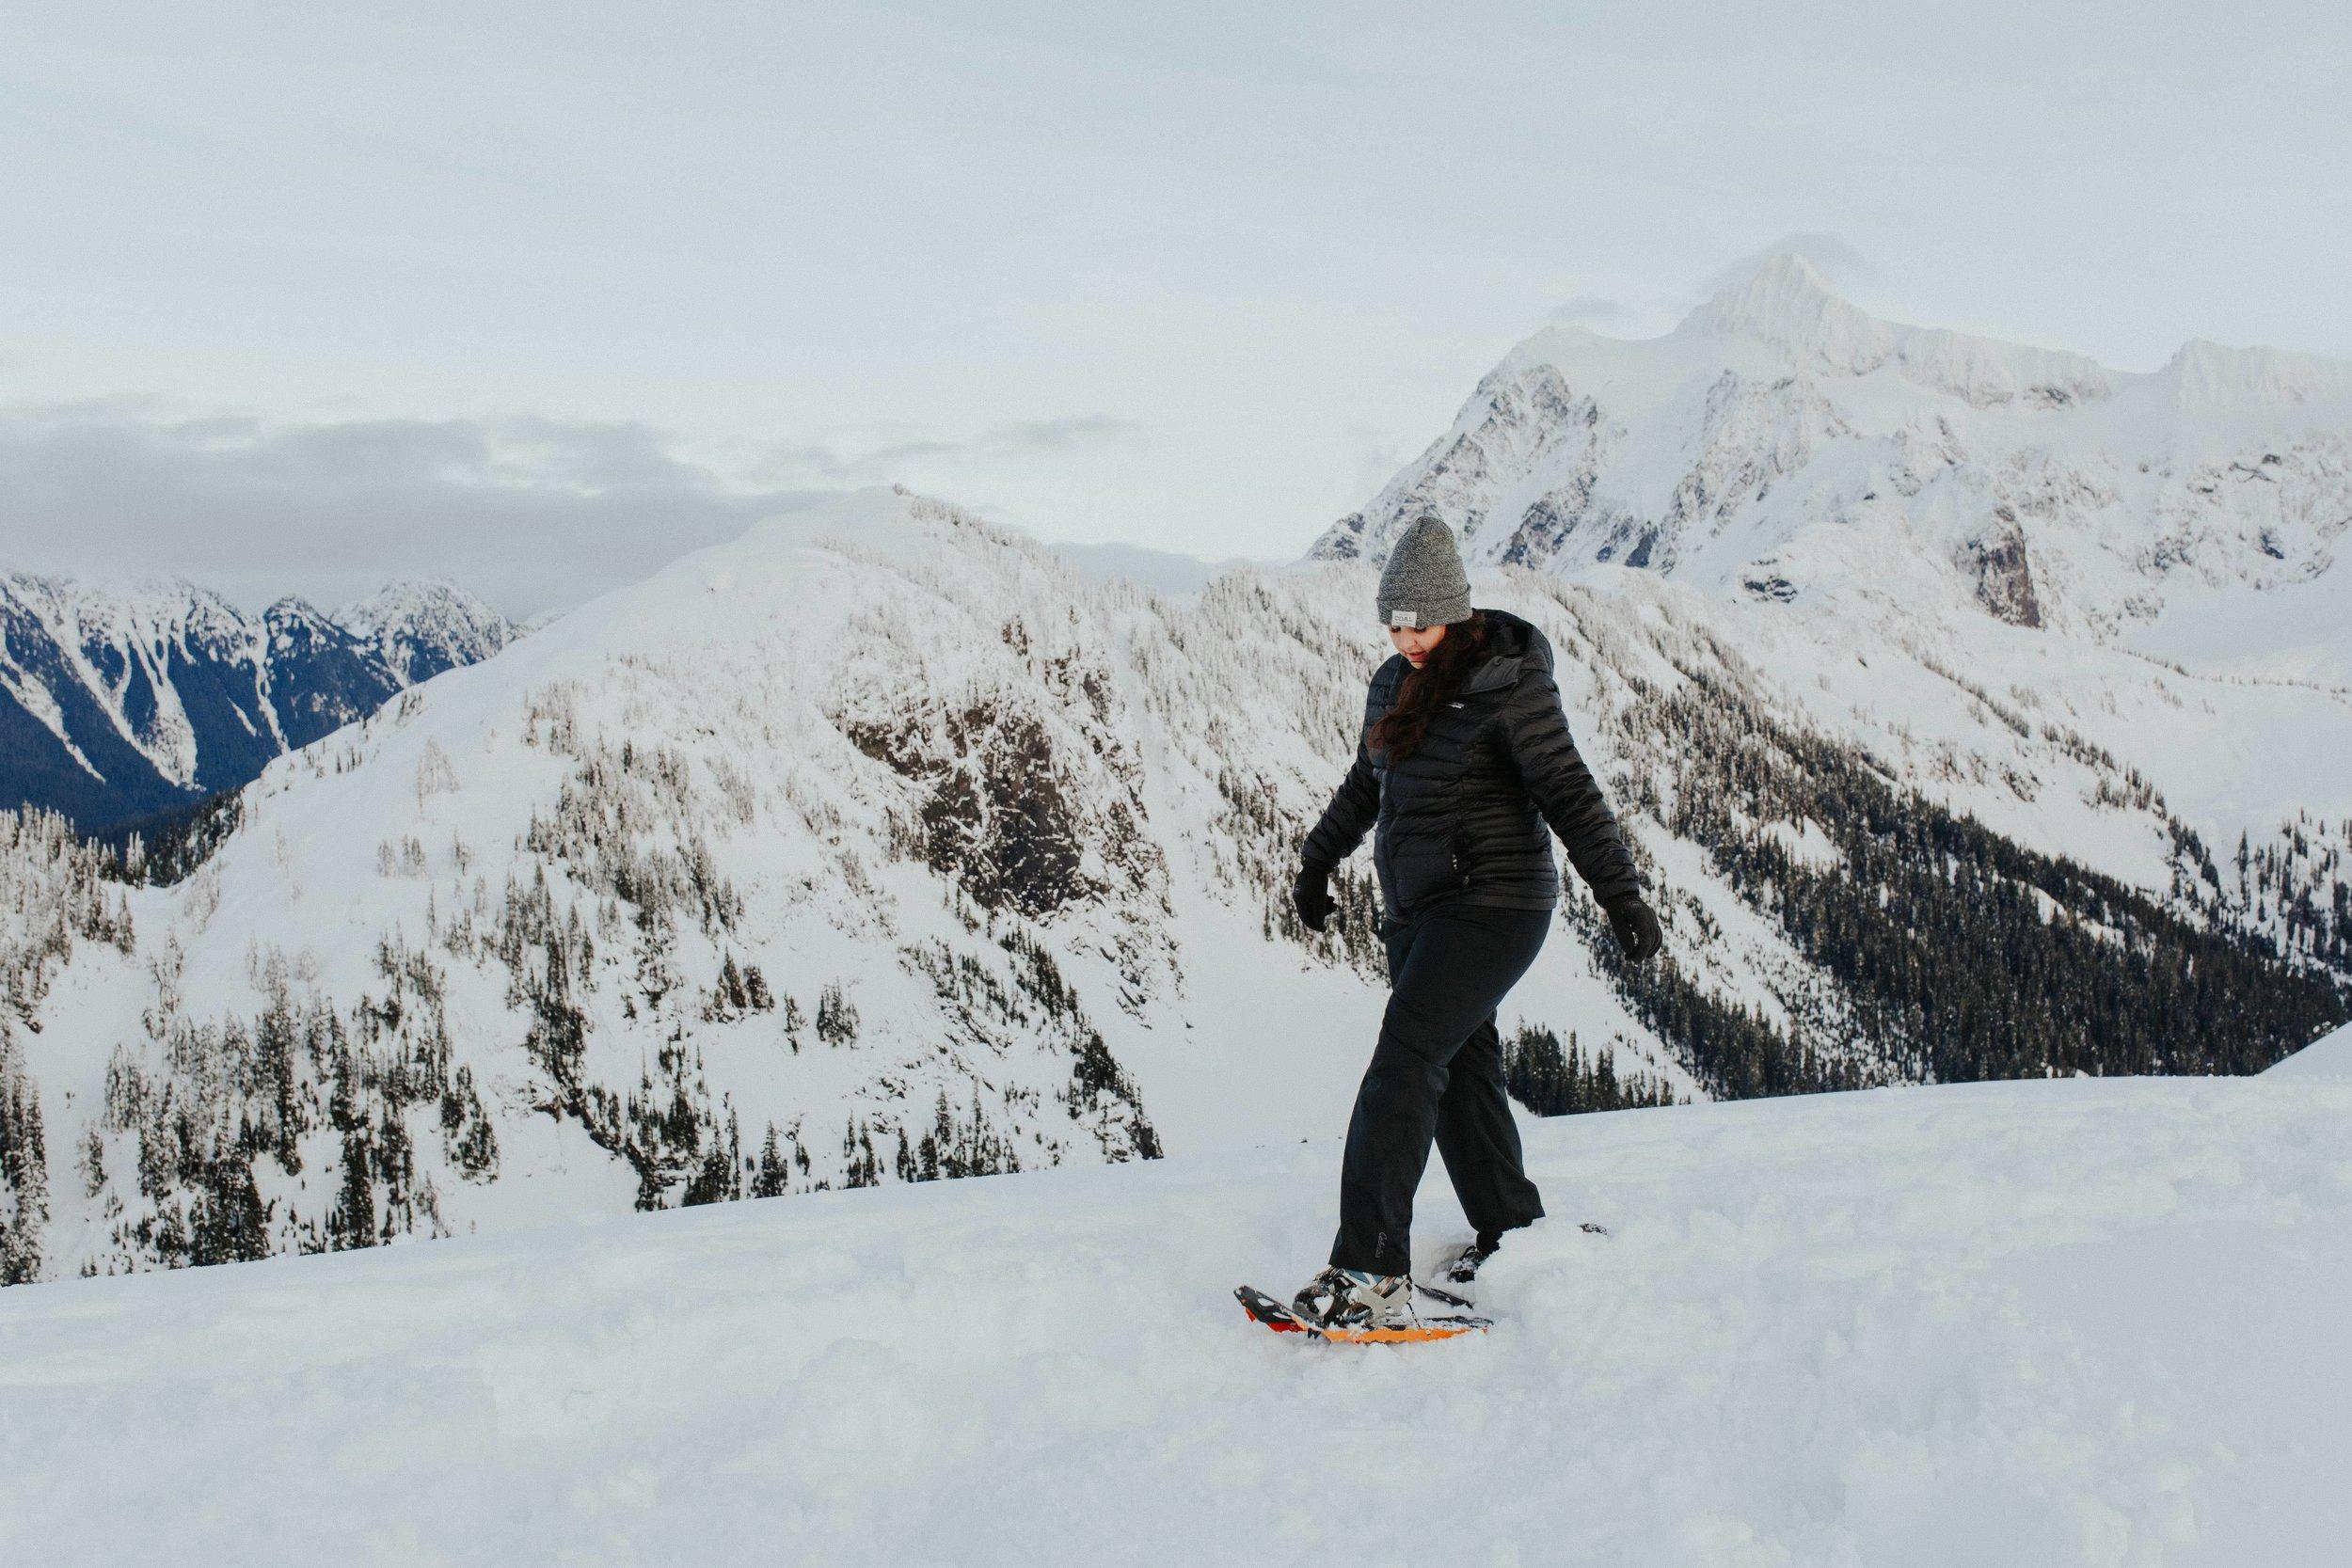 mount-baker-snow-camping-snowshoes.jpg